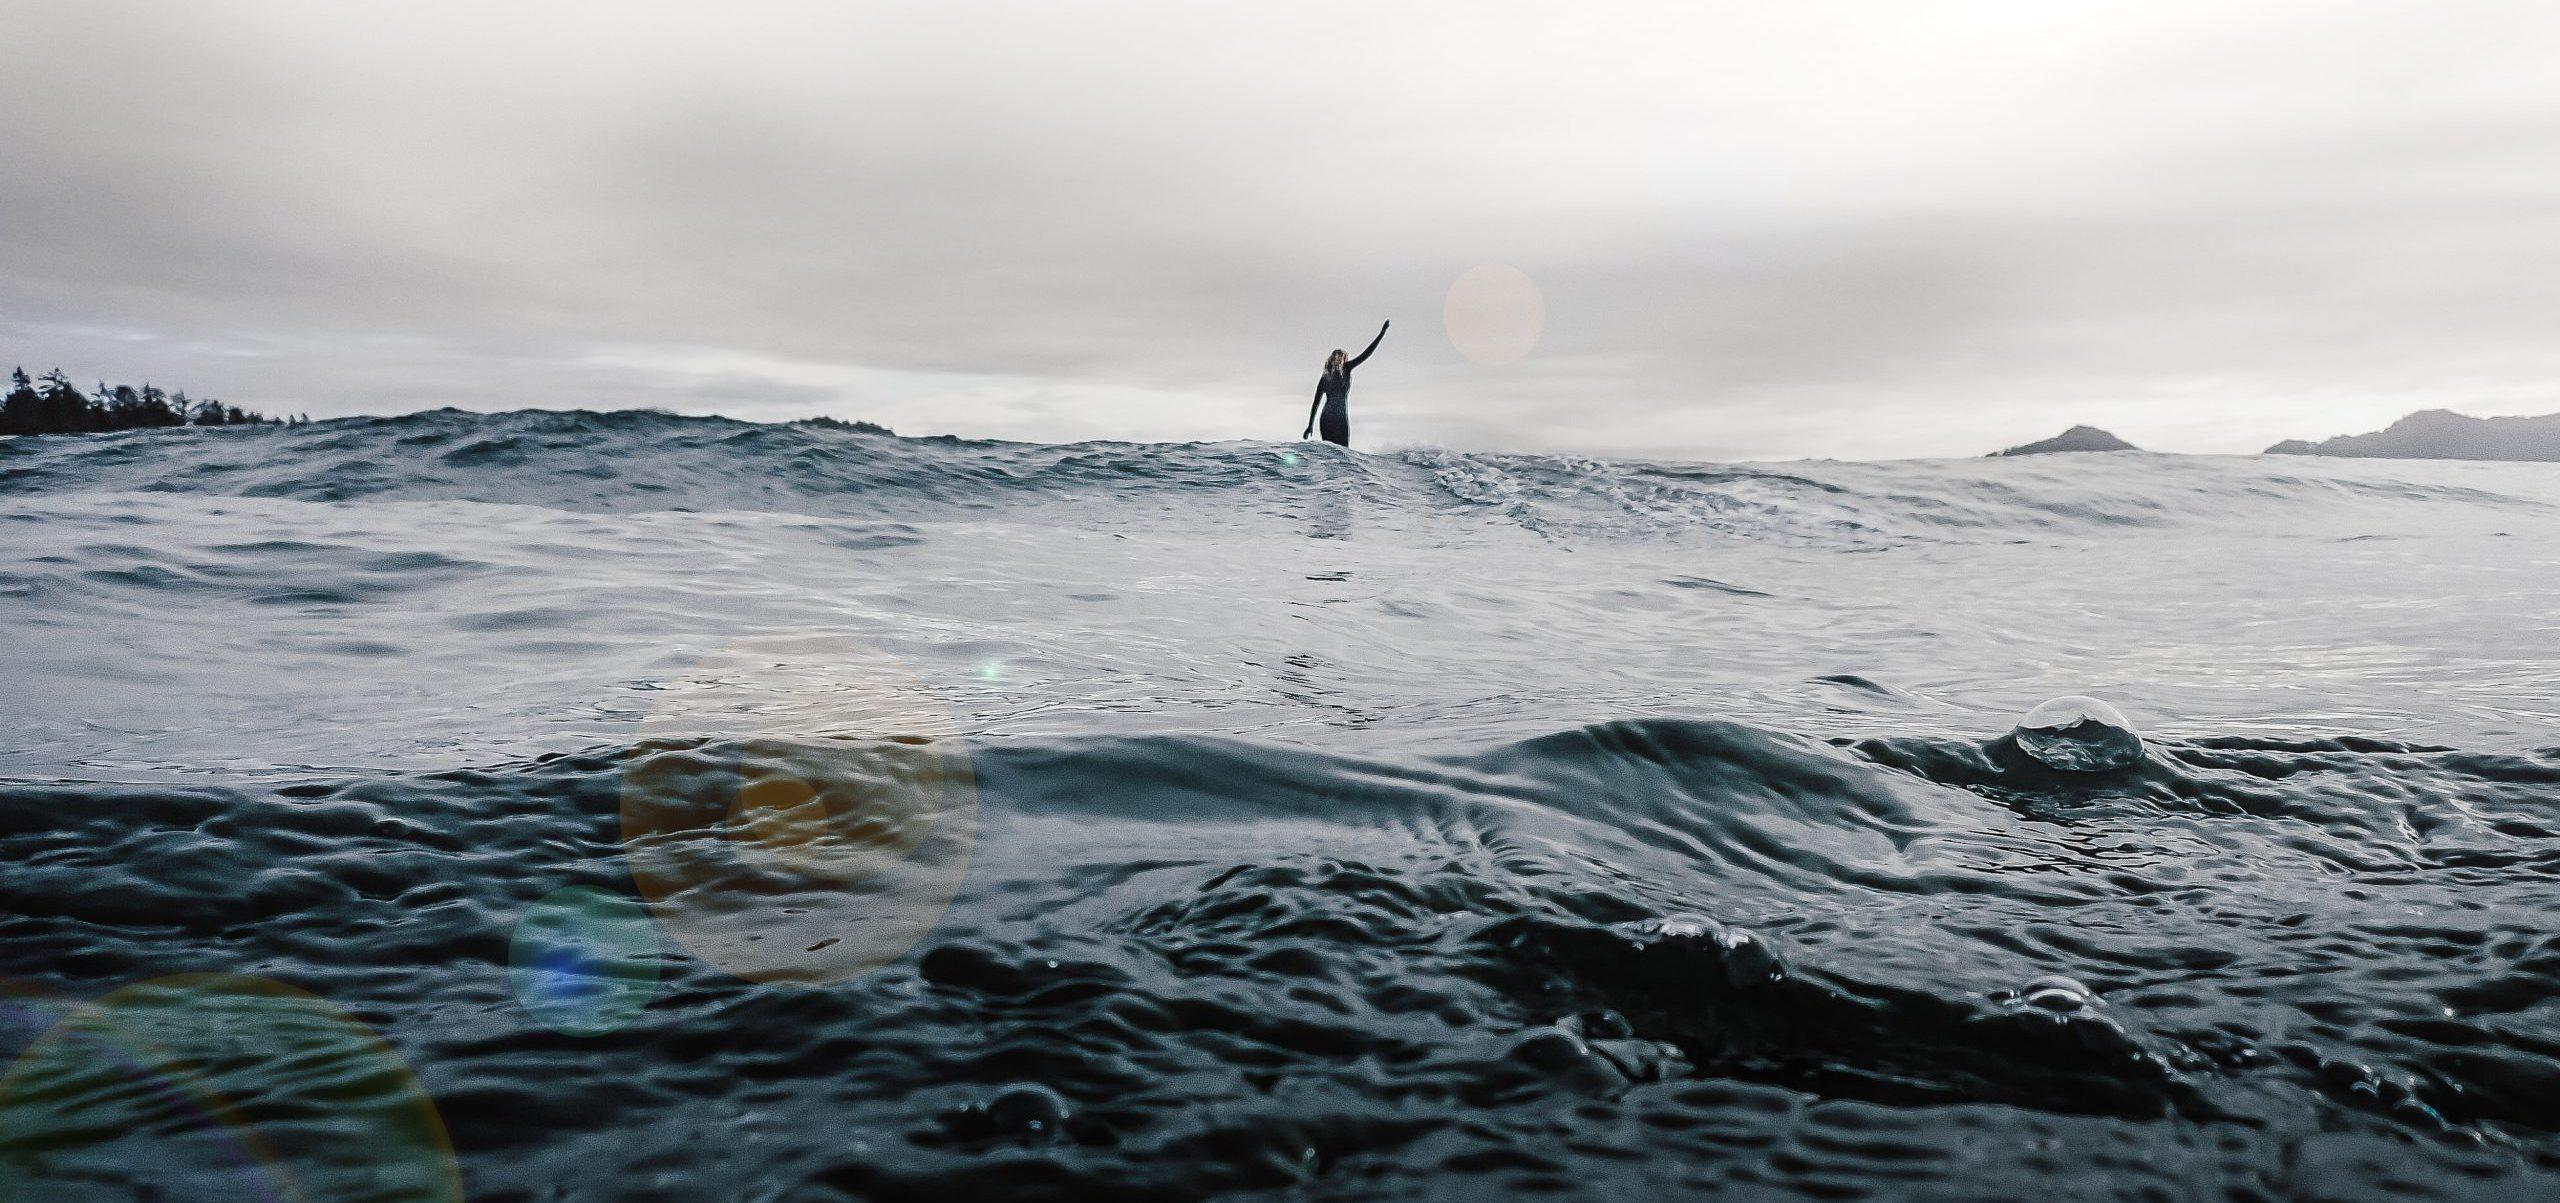 Surfgrove - Tofino Surfing